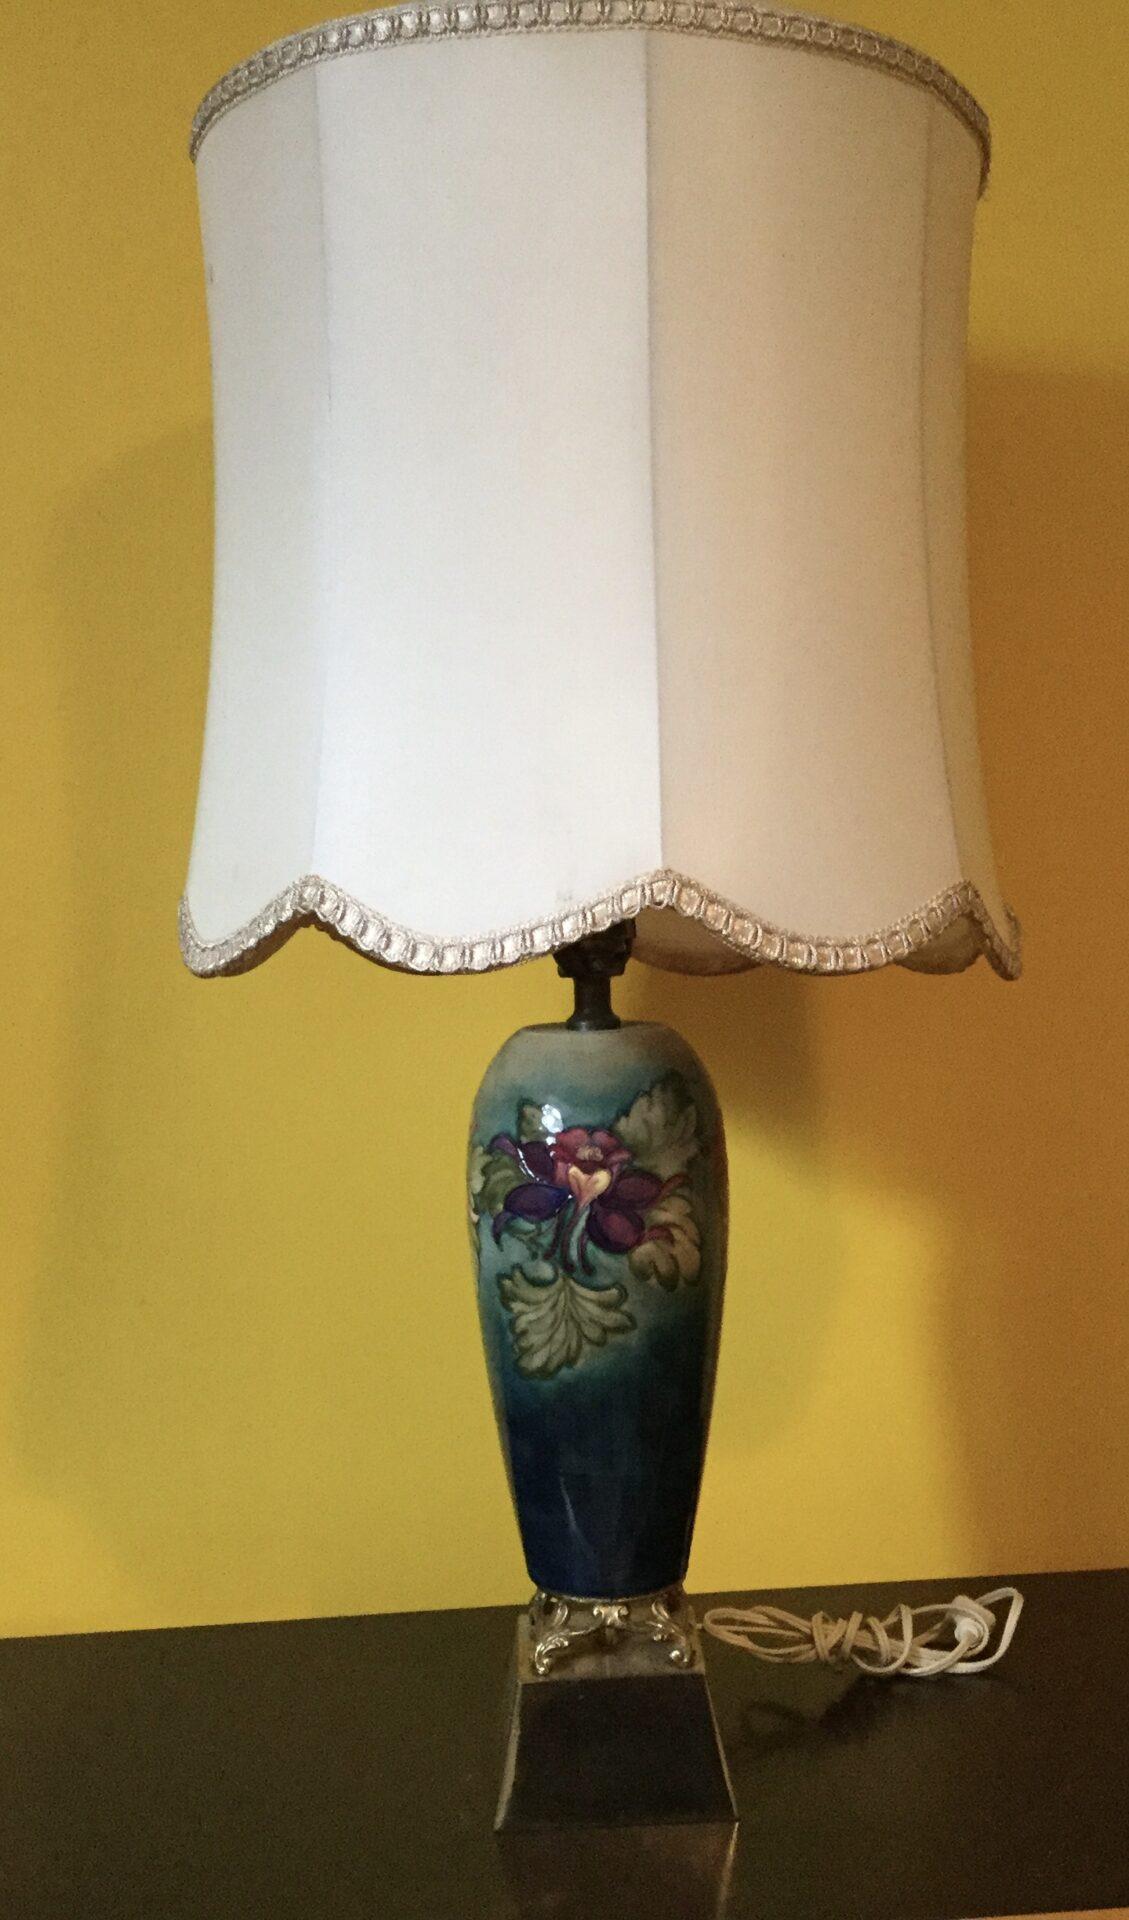 Moorcroft lamp 1950